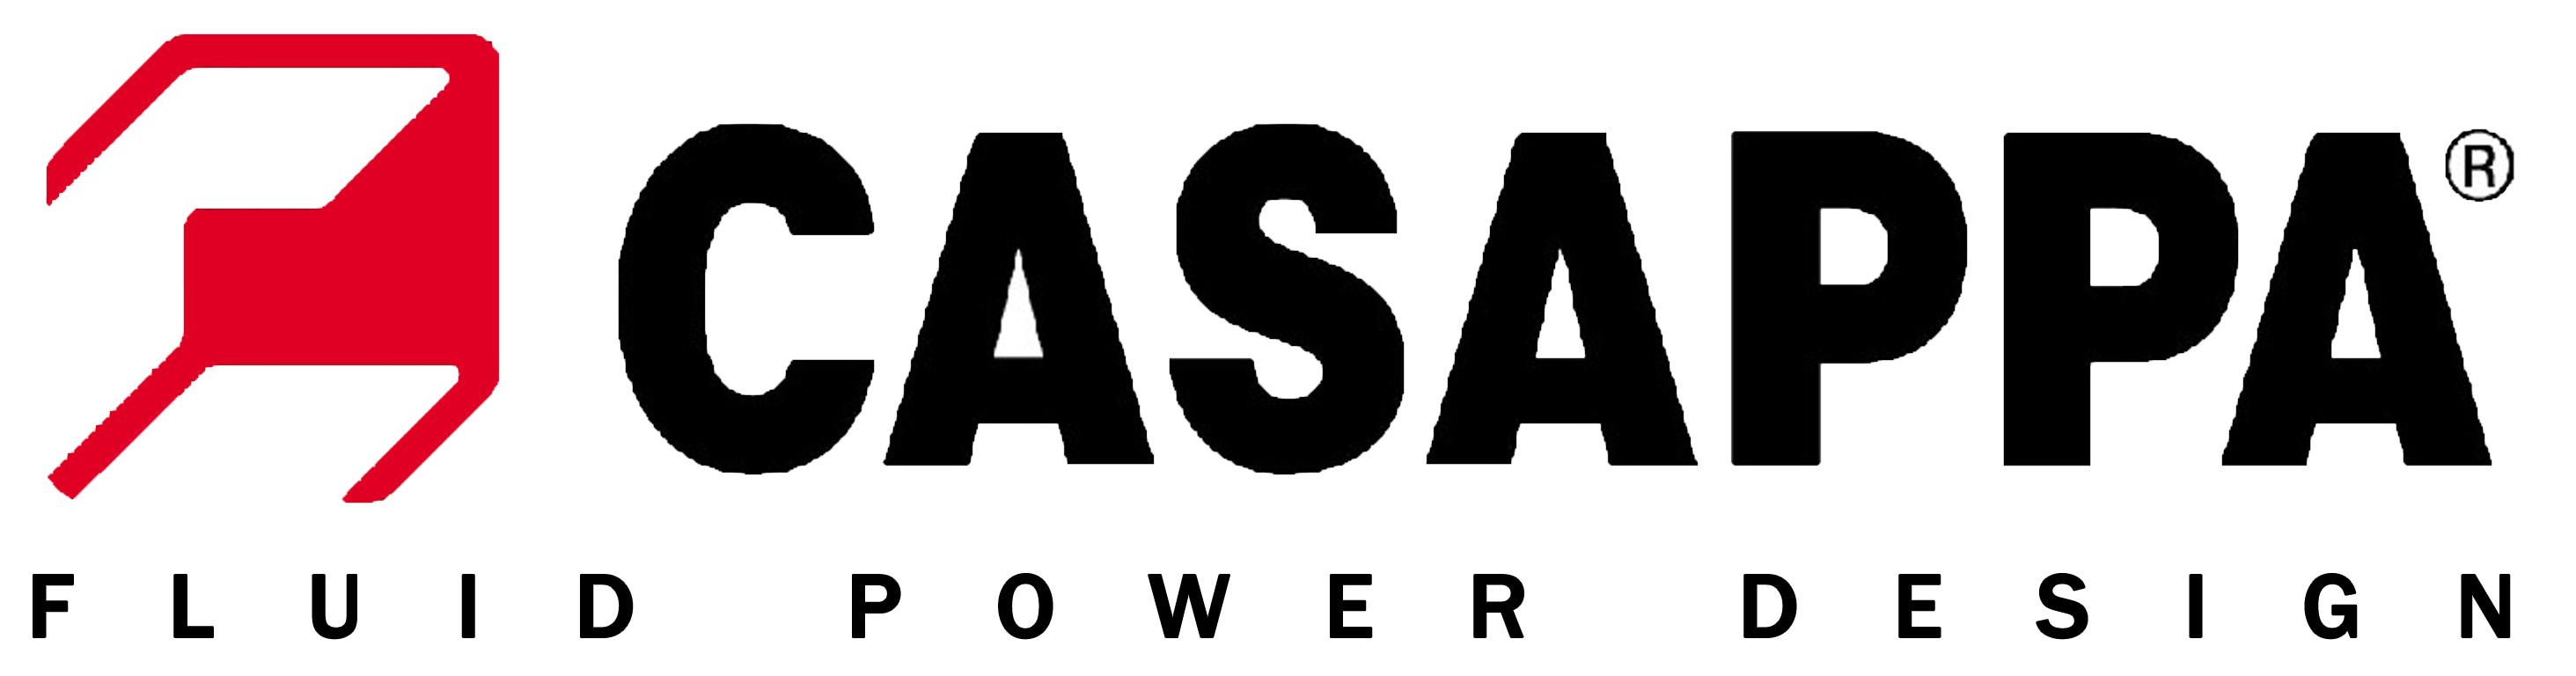 logo-casappa